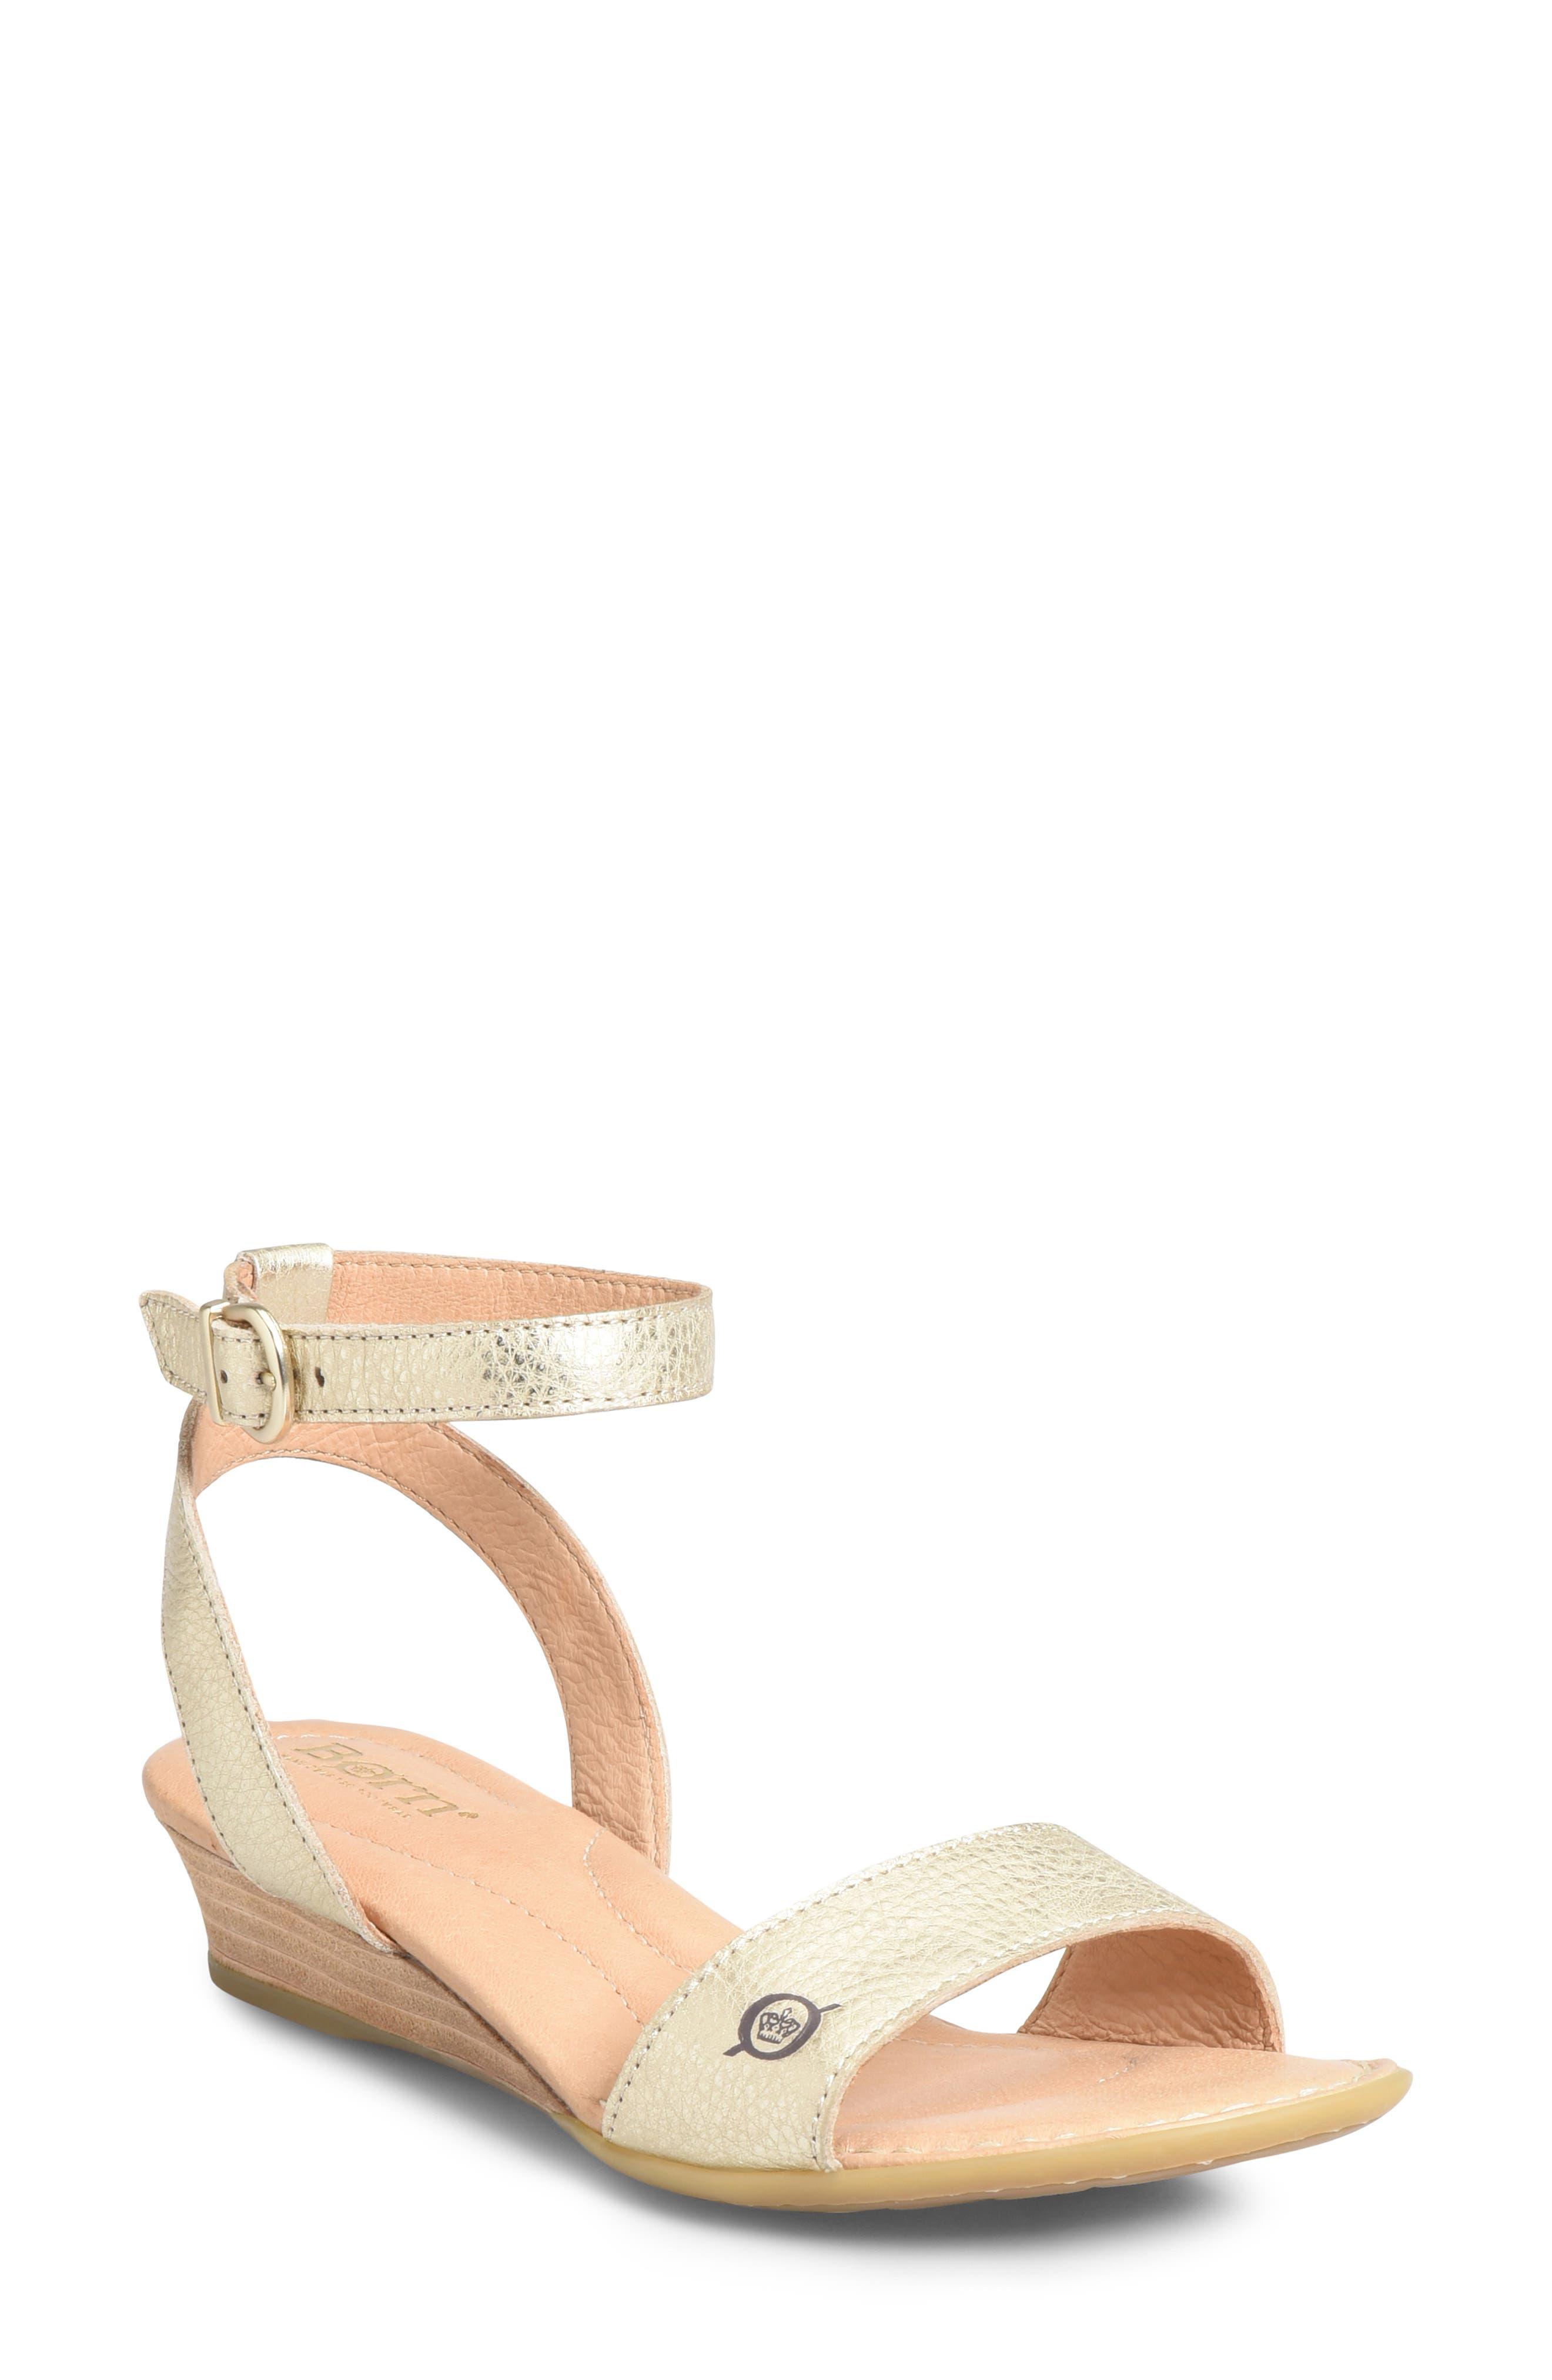 B?rn Sevier Wedge Sandal, Metallic